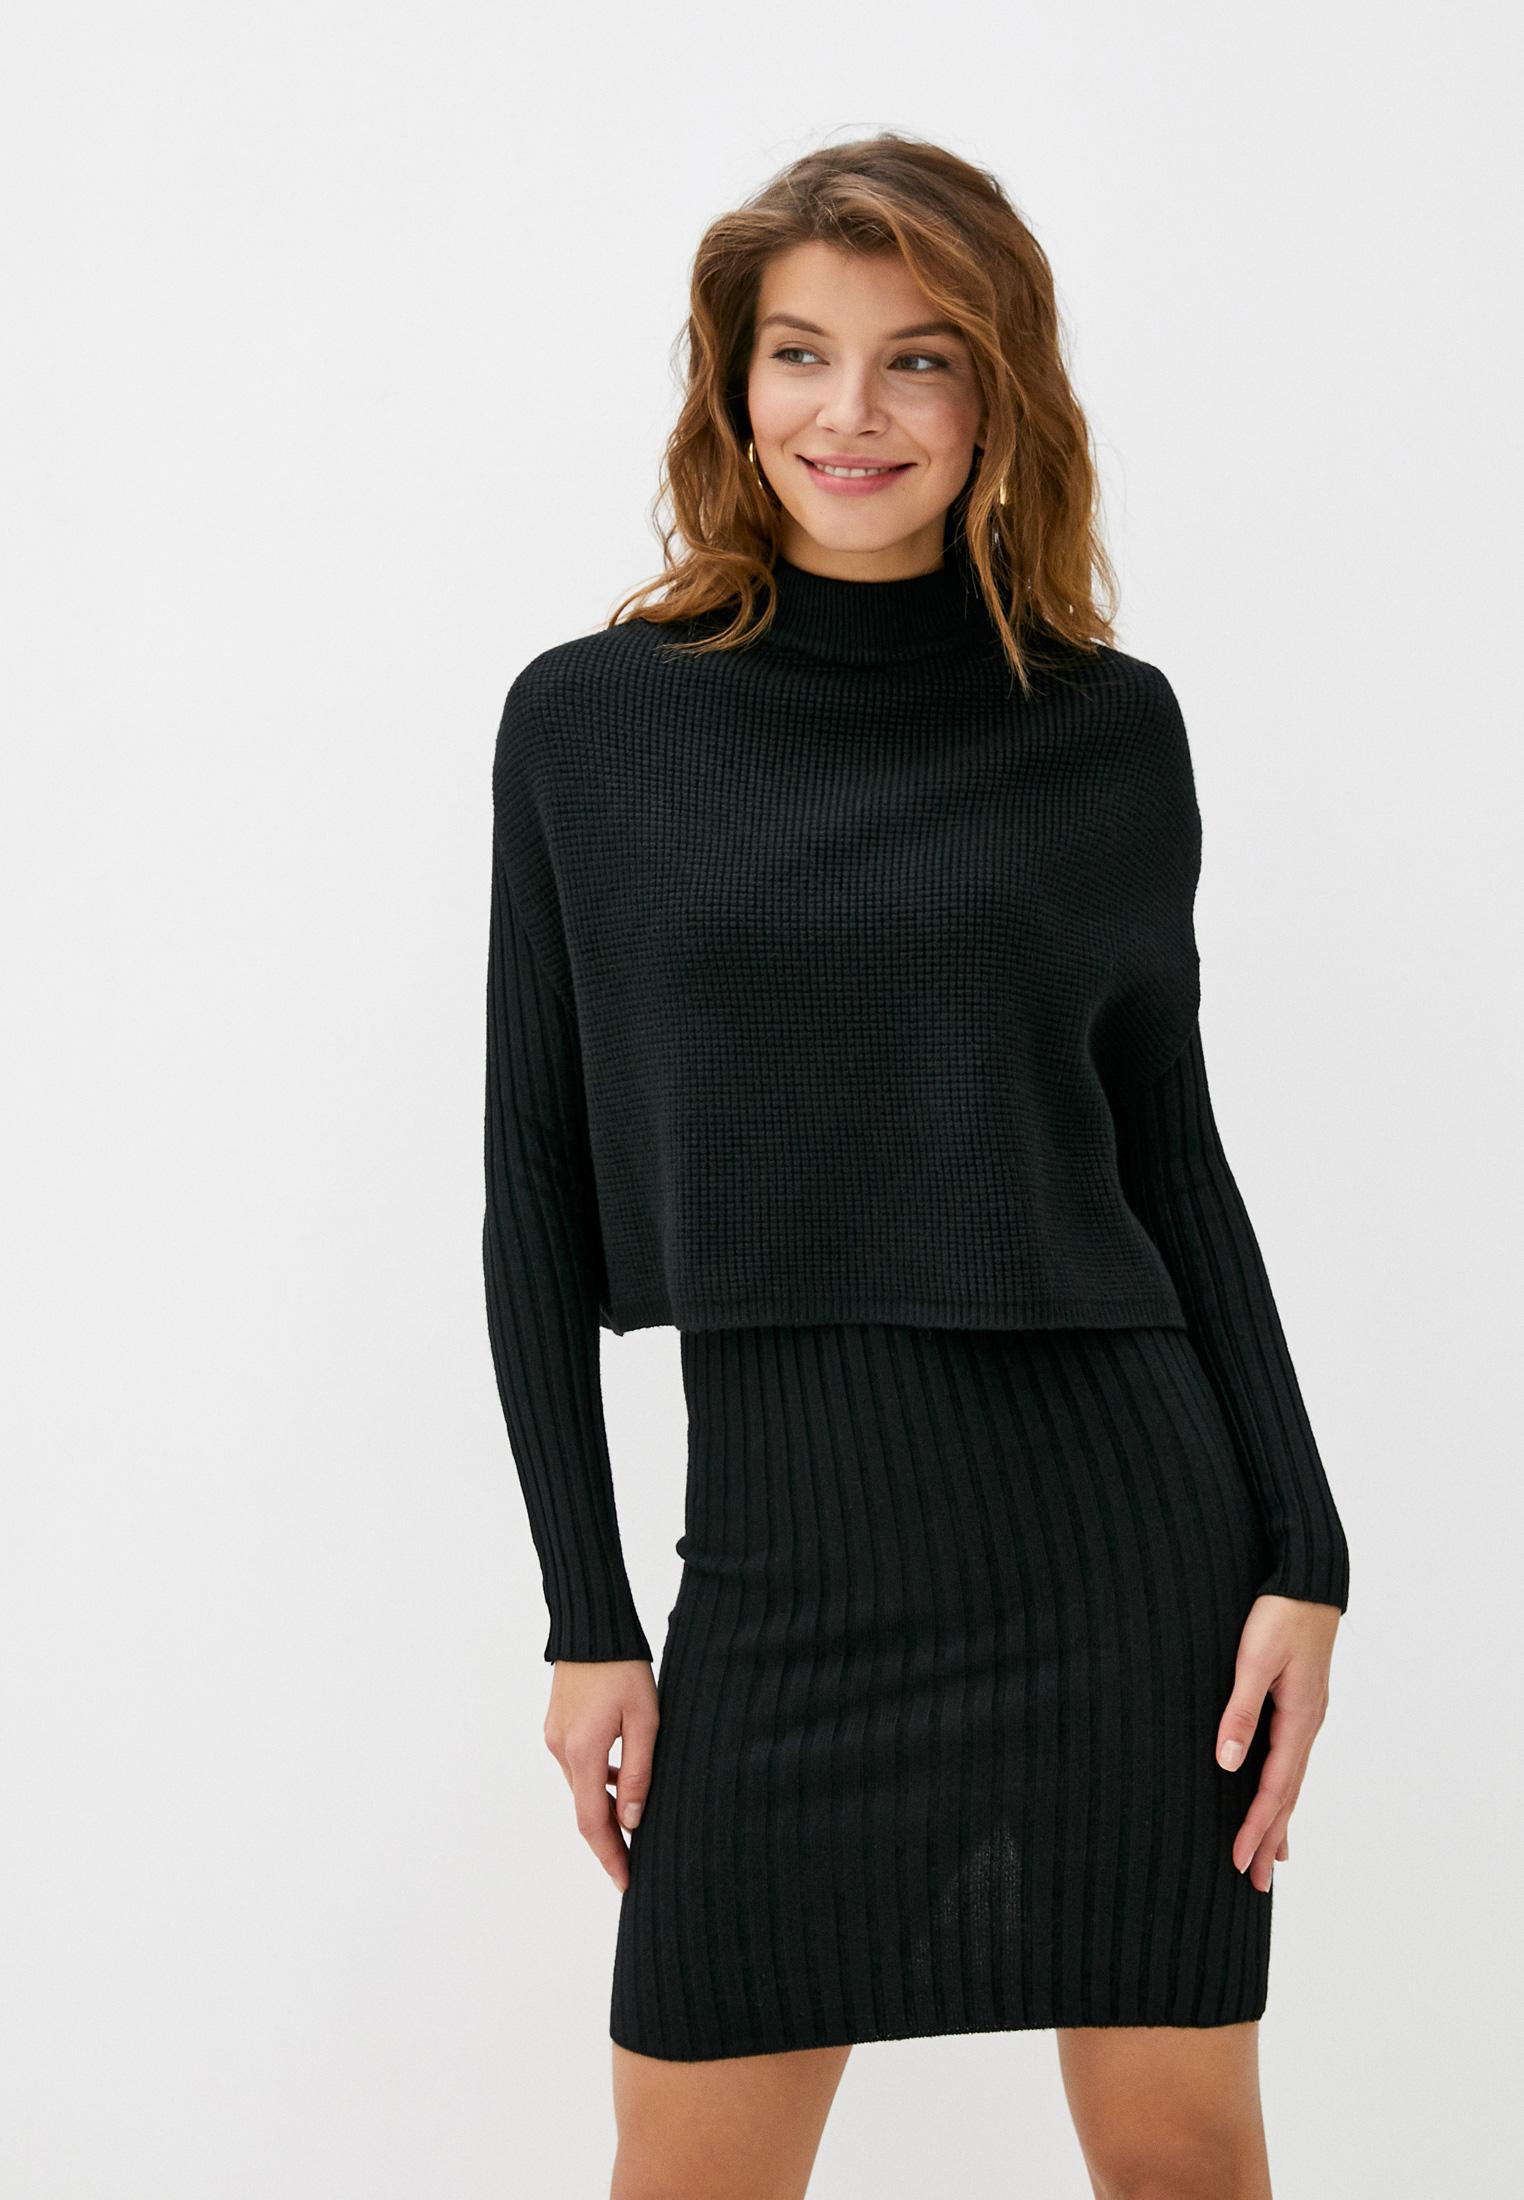 Вязаное платье Vickwool WV150-1